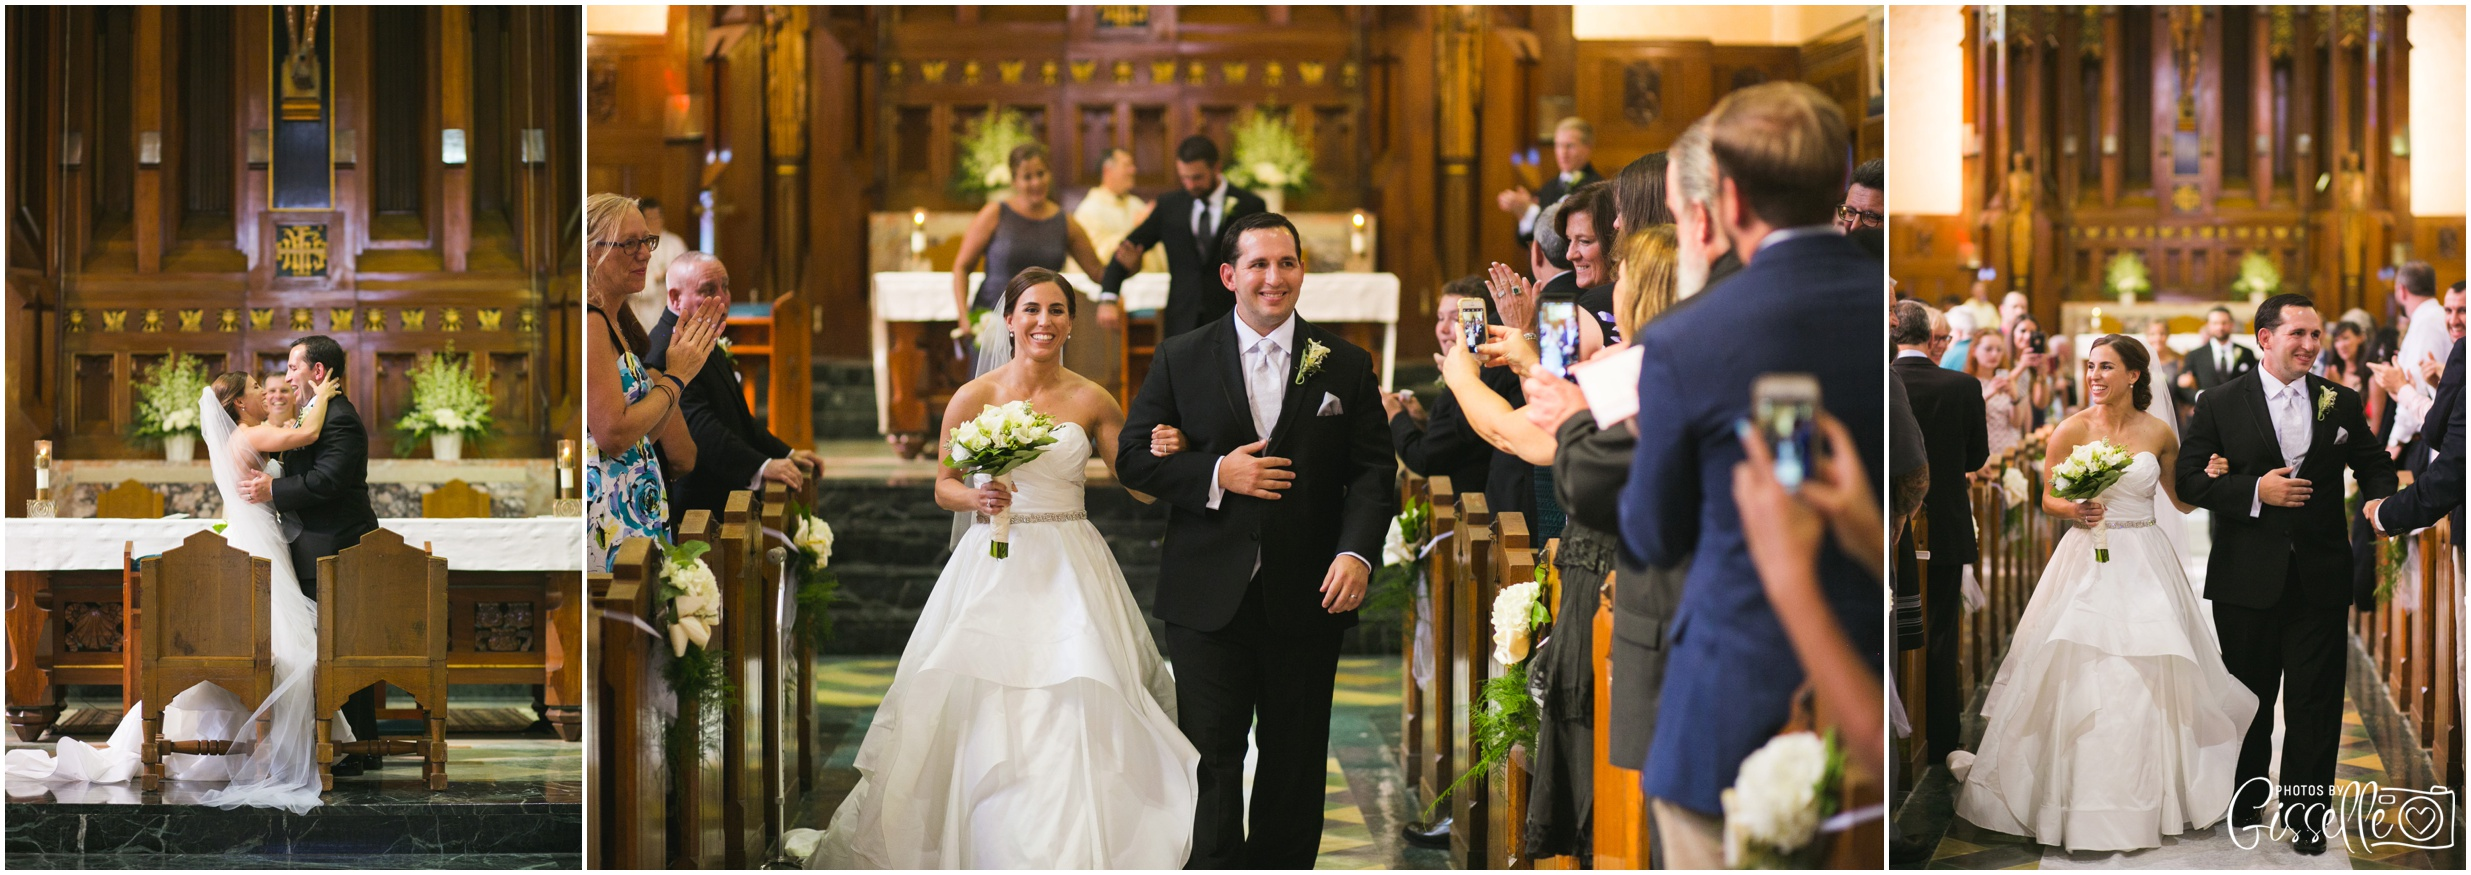 Congress Hotel Wedding_0051.jpg